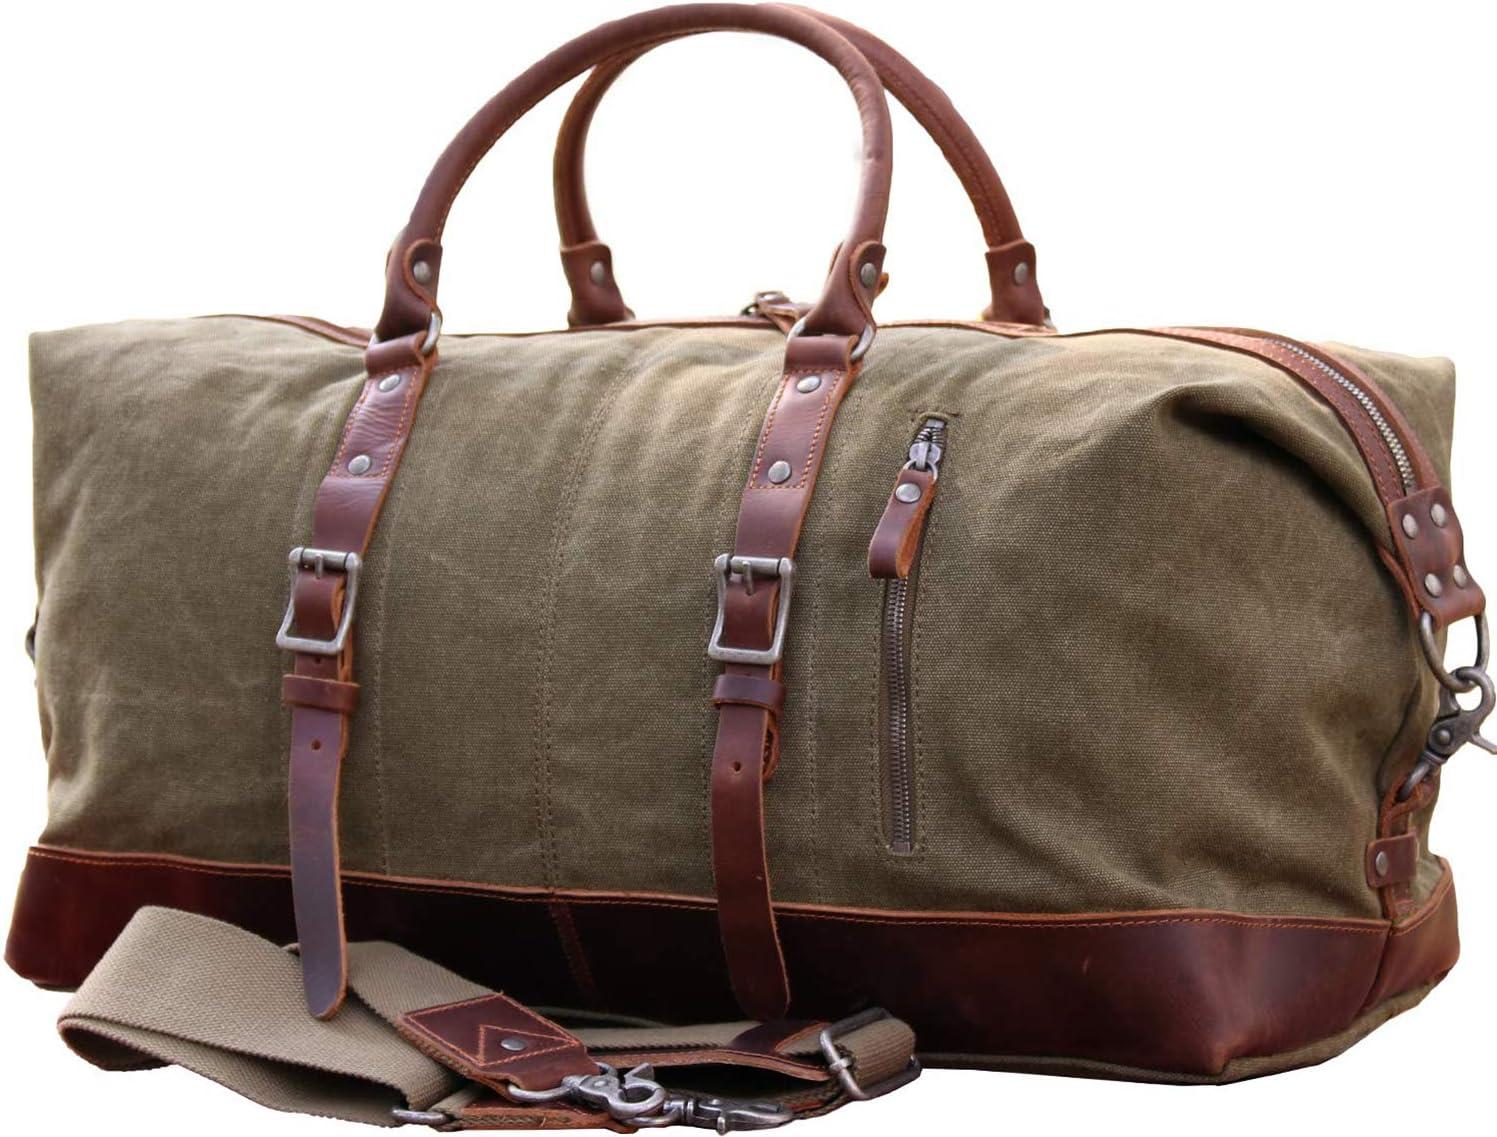 IBLUE Oversized Canvas Genuine Leather Trim Travel Tote Duffel Shoulder Weekend Bag Weekender Overnight Carryon Handbag Updated Version